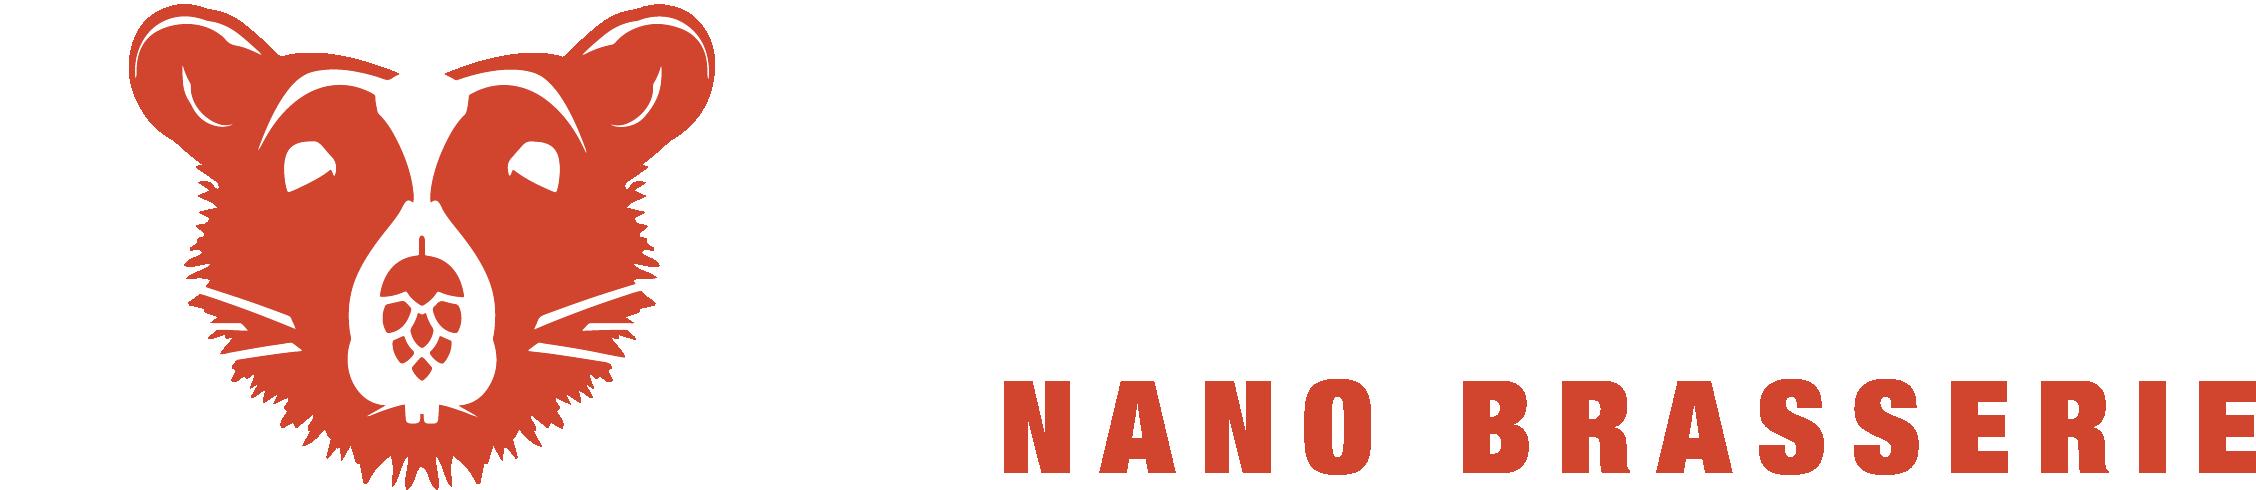 Le sous-sol - Nano Brasserie